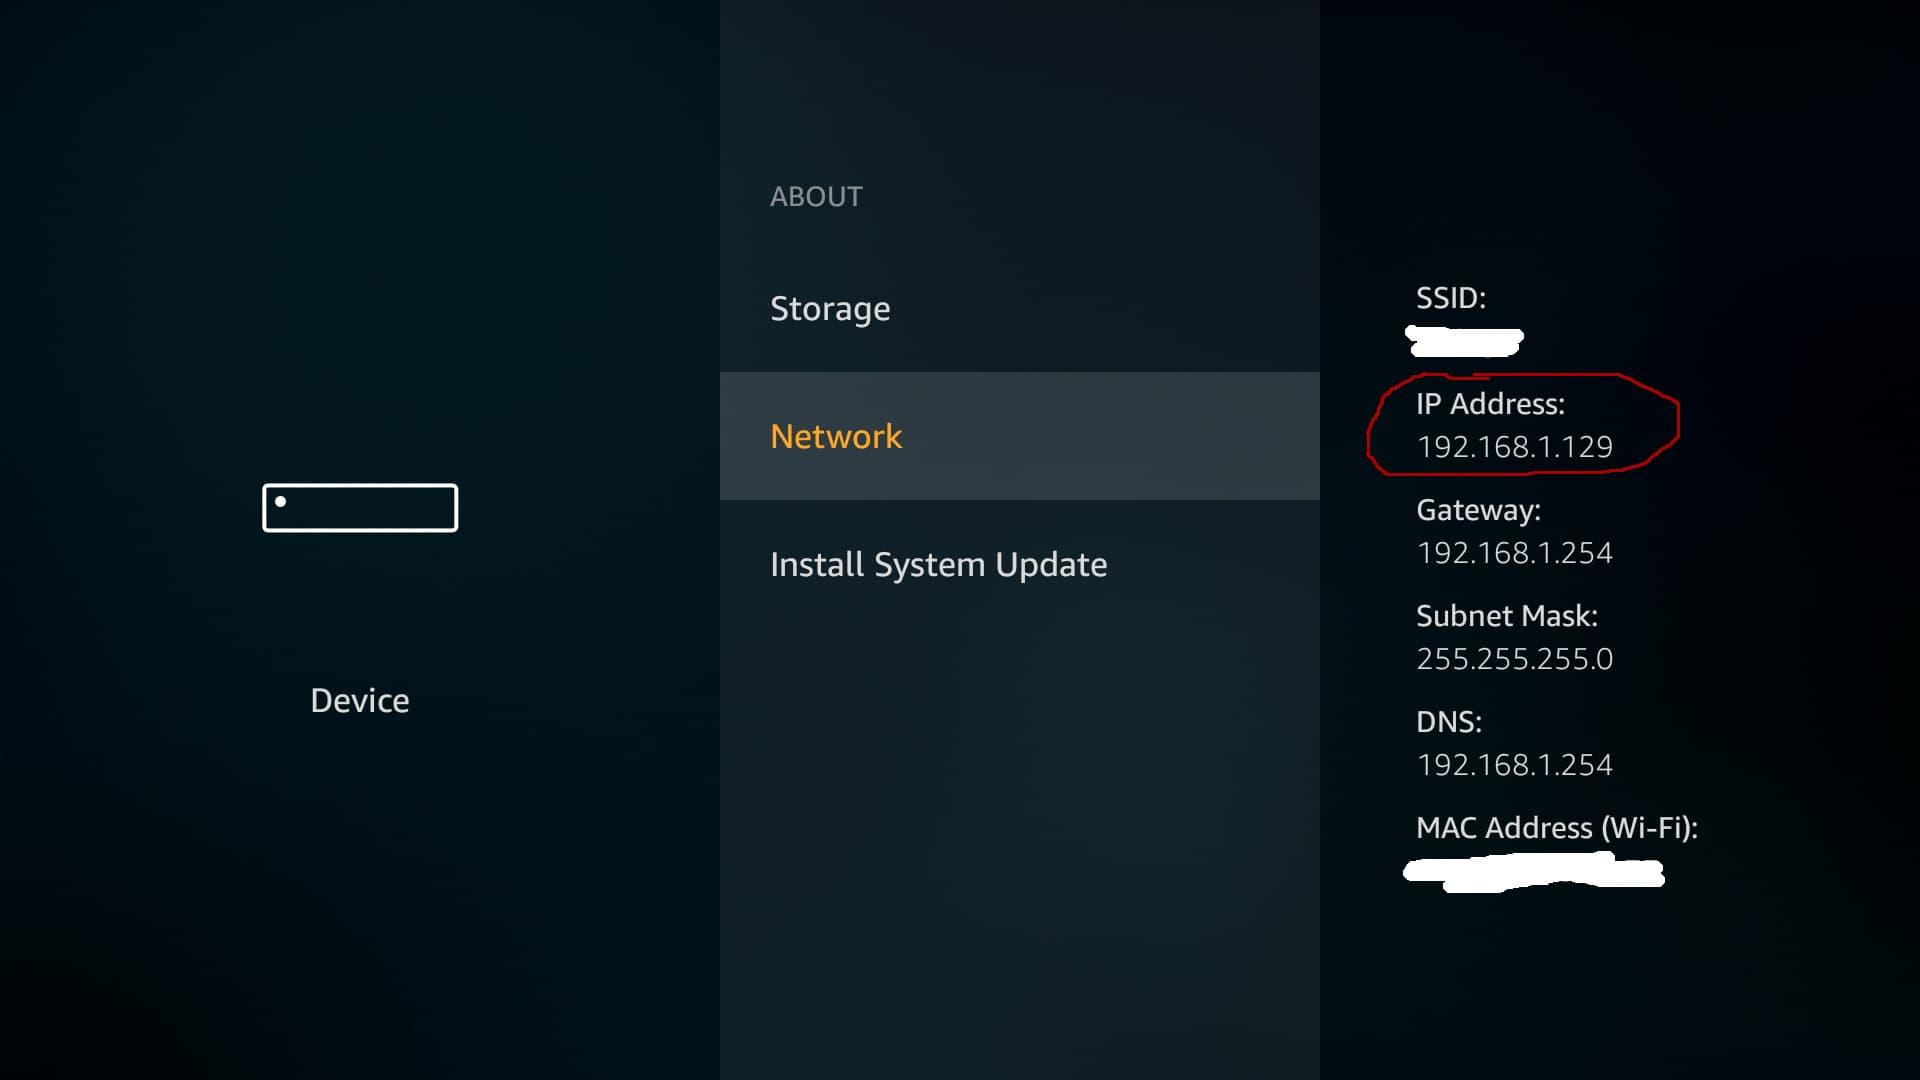 On the settings menu select device